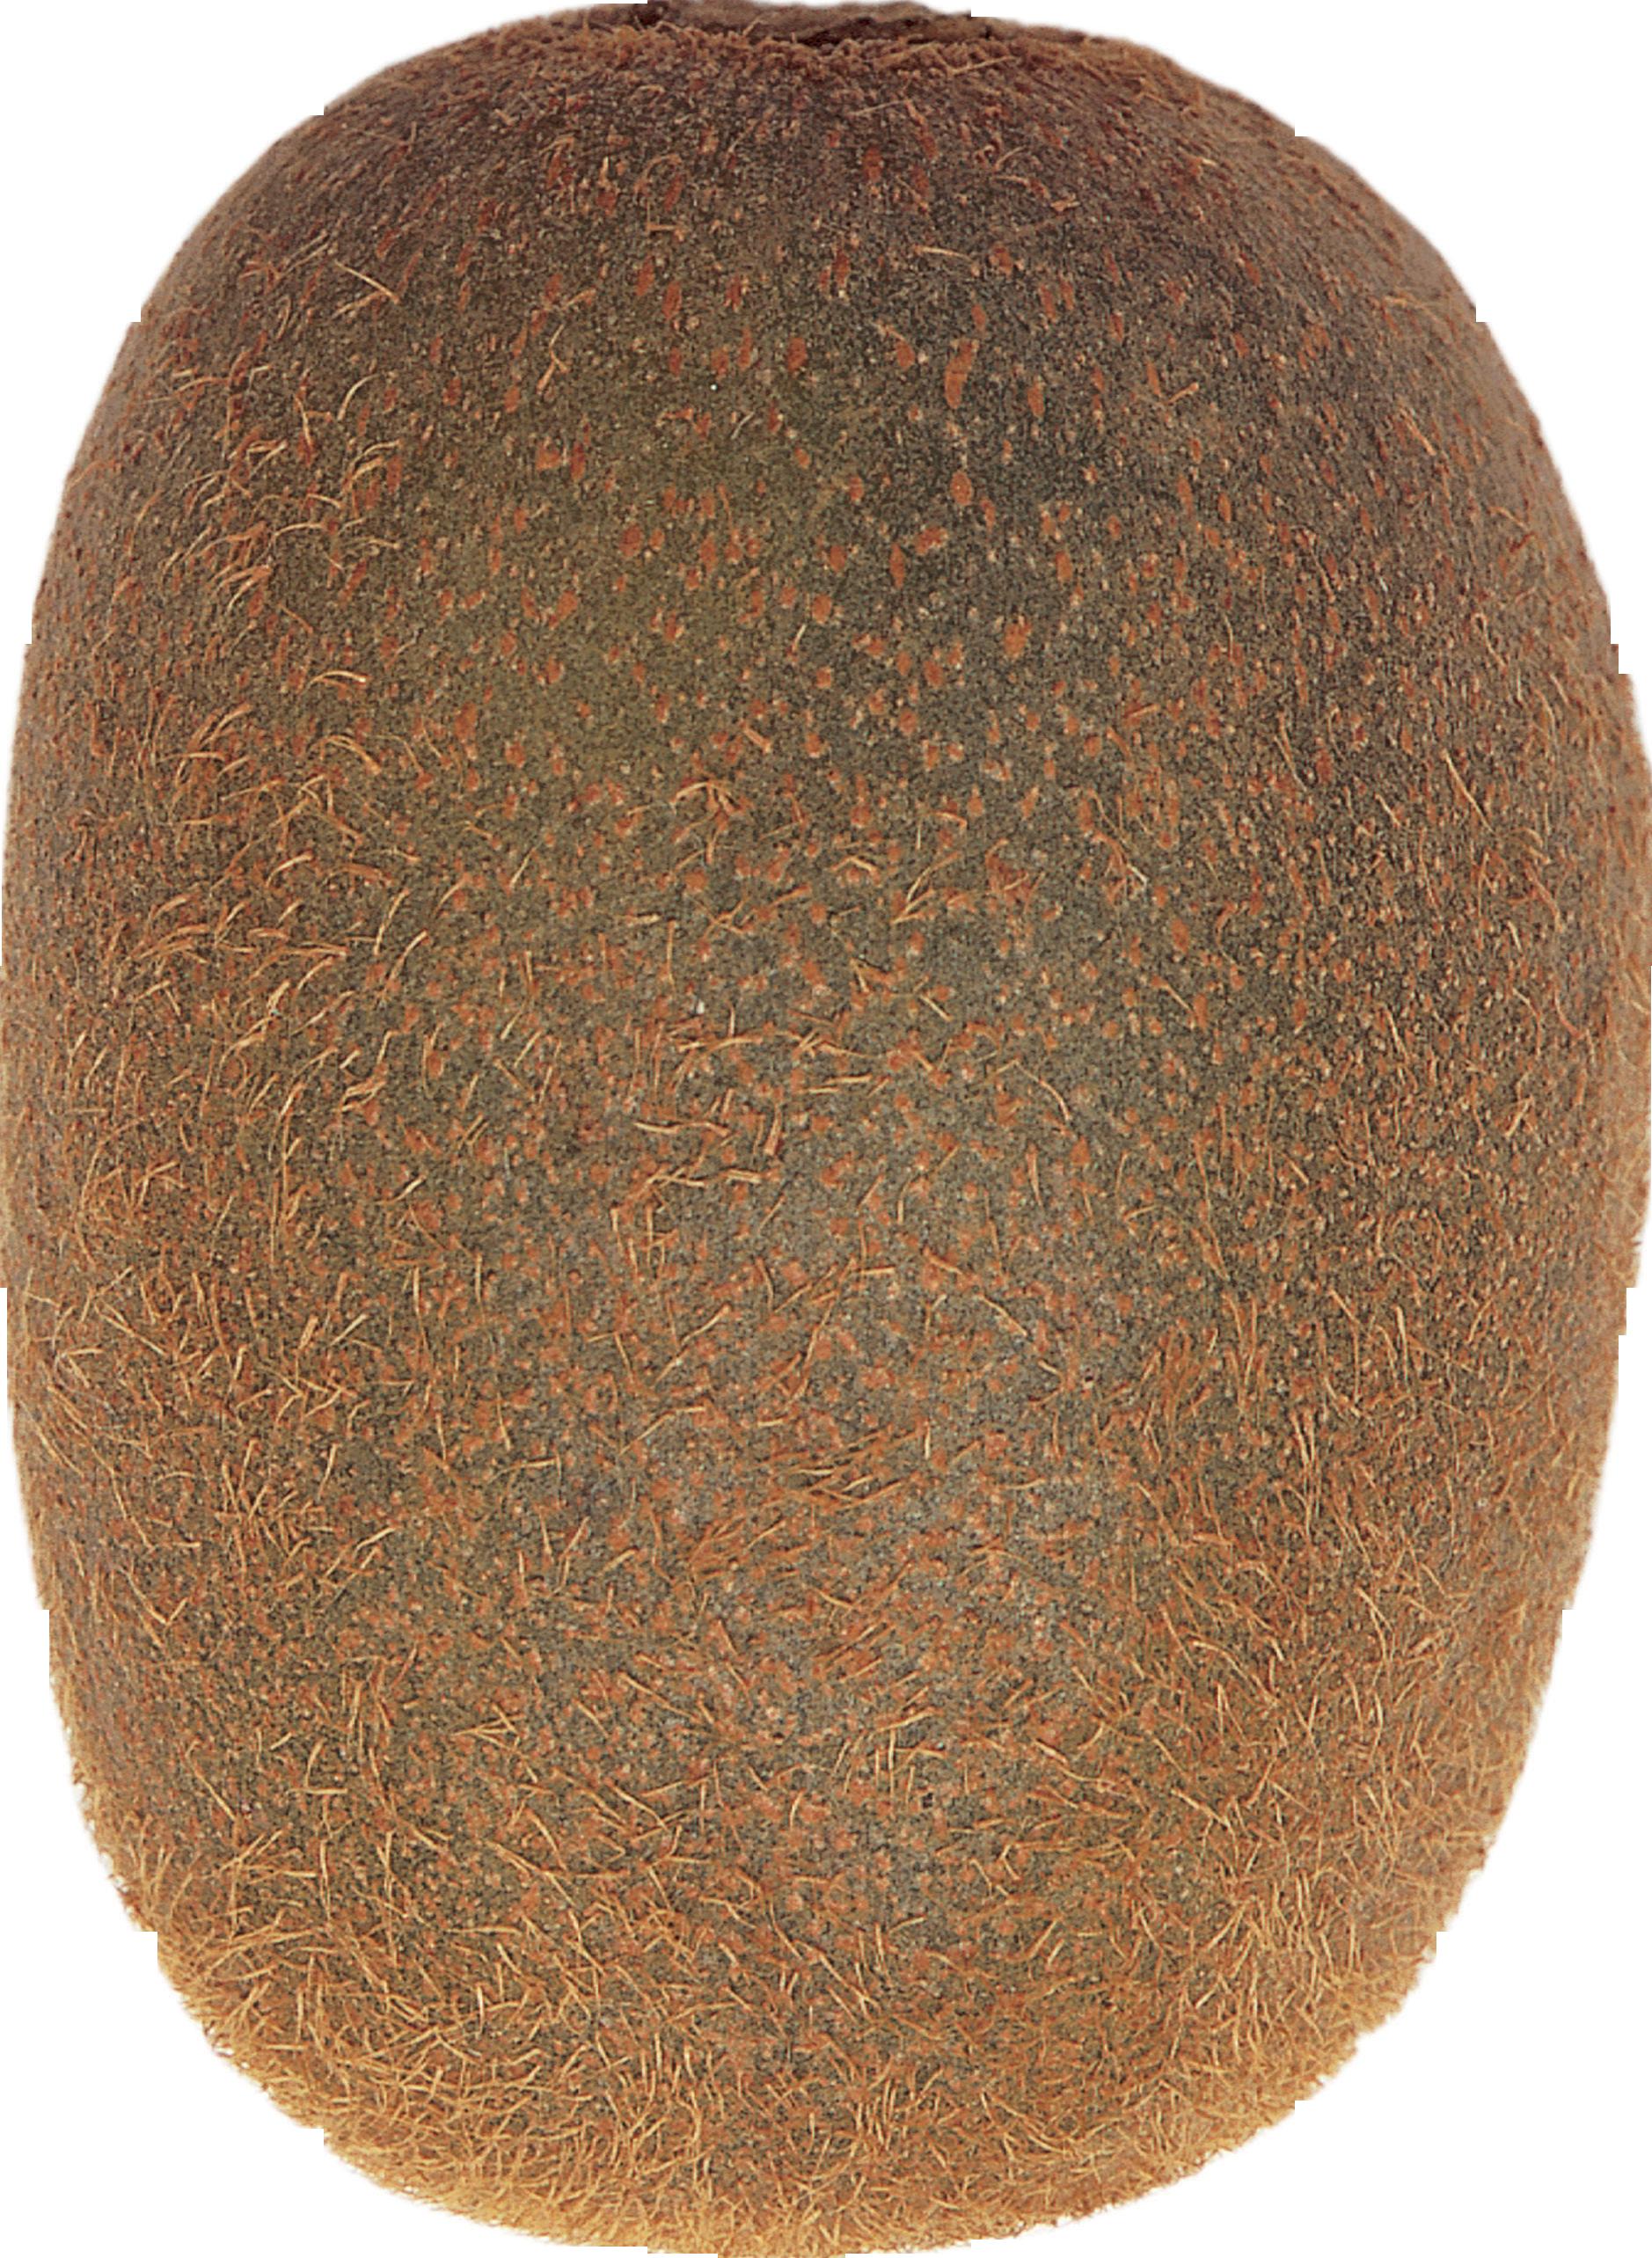 Kiwi clipart transparent background. Png image free fruit